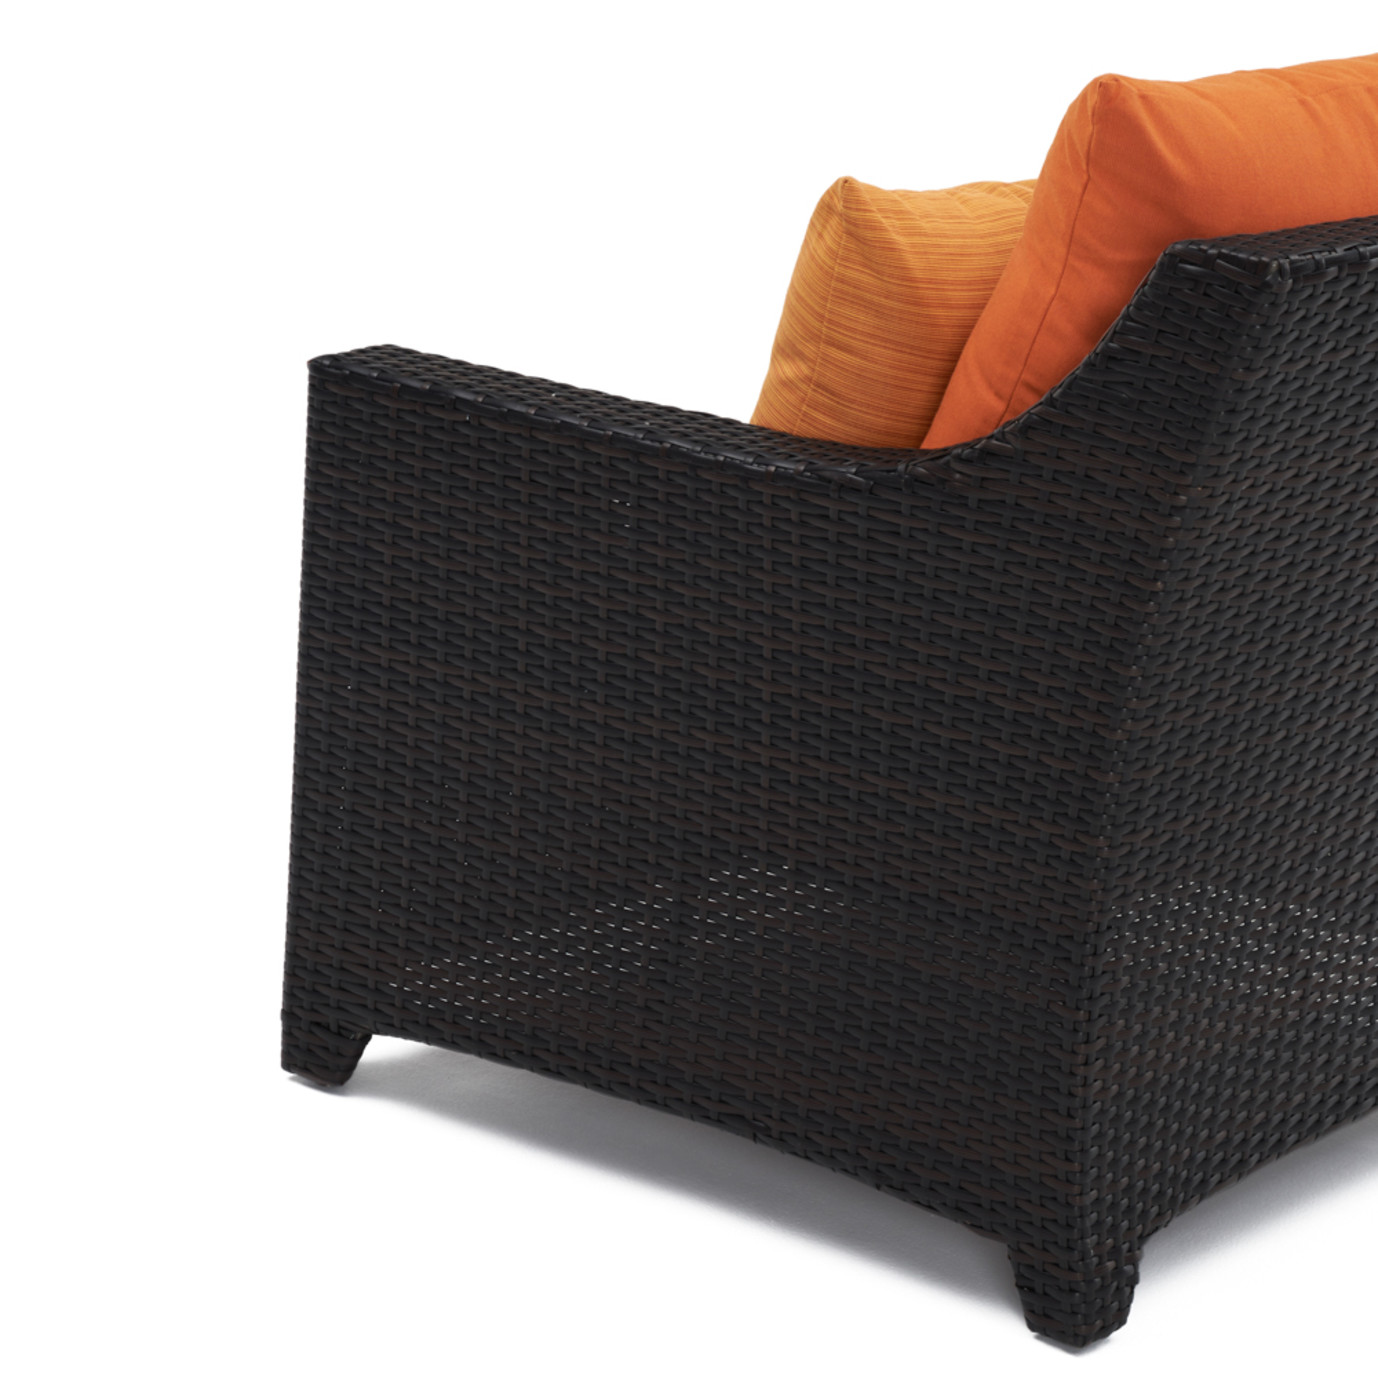 Deco™ Sofa with Coffee Table - Tikka Orange